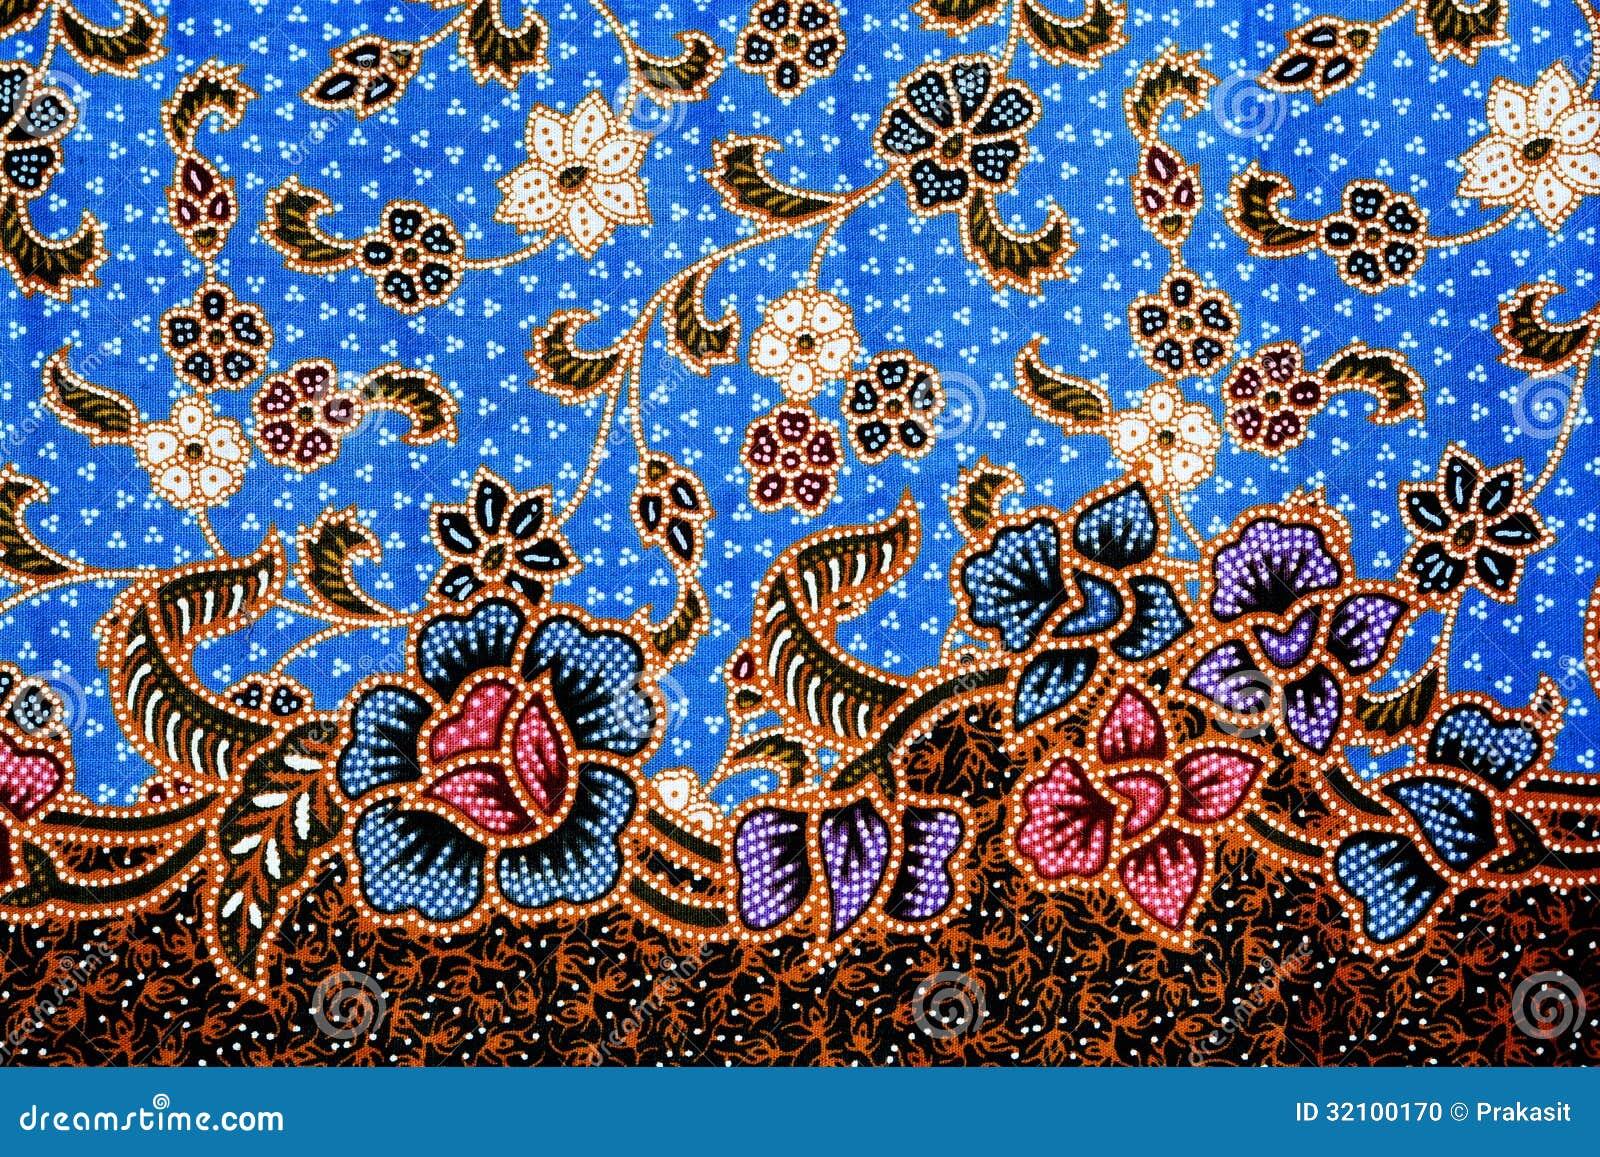 Colorful Batik Cloth Fabric Background Stock Photo